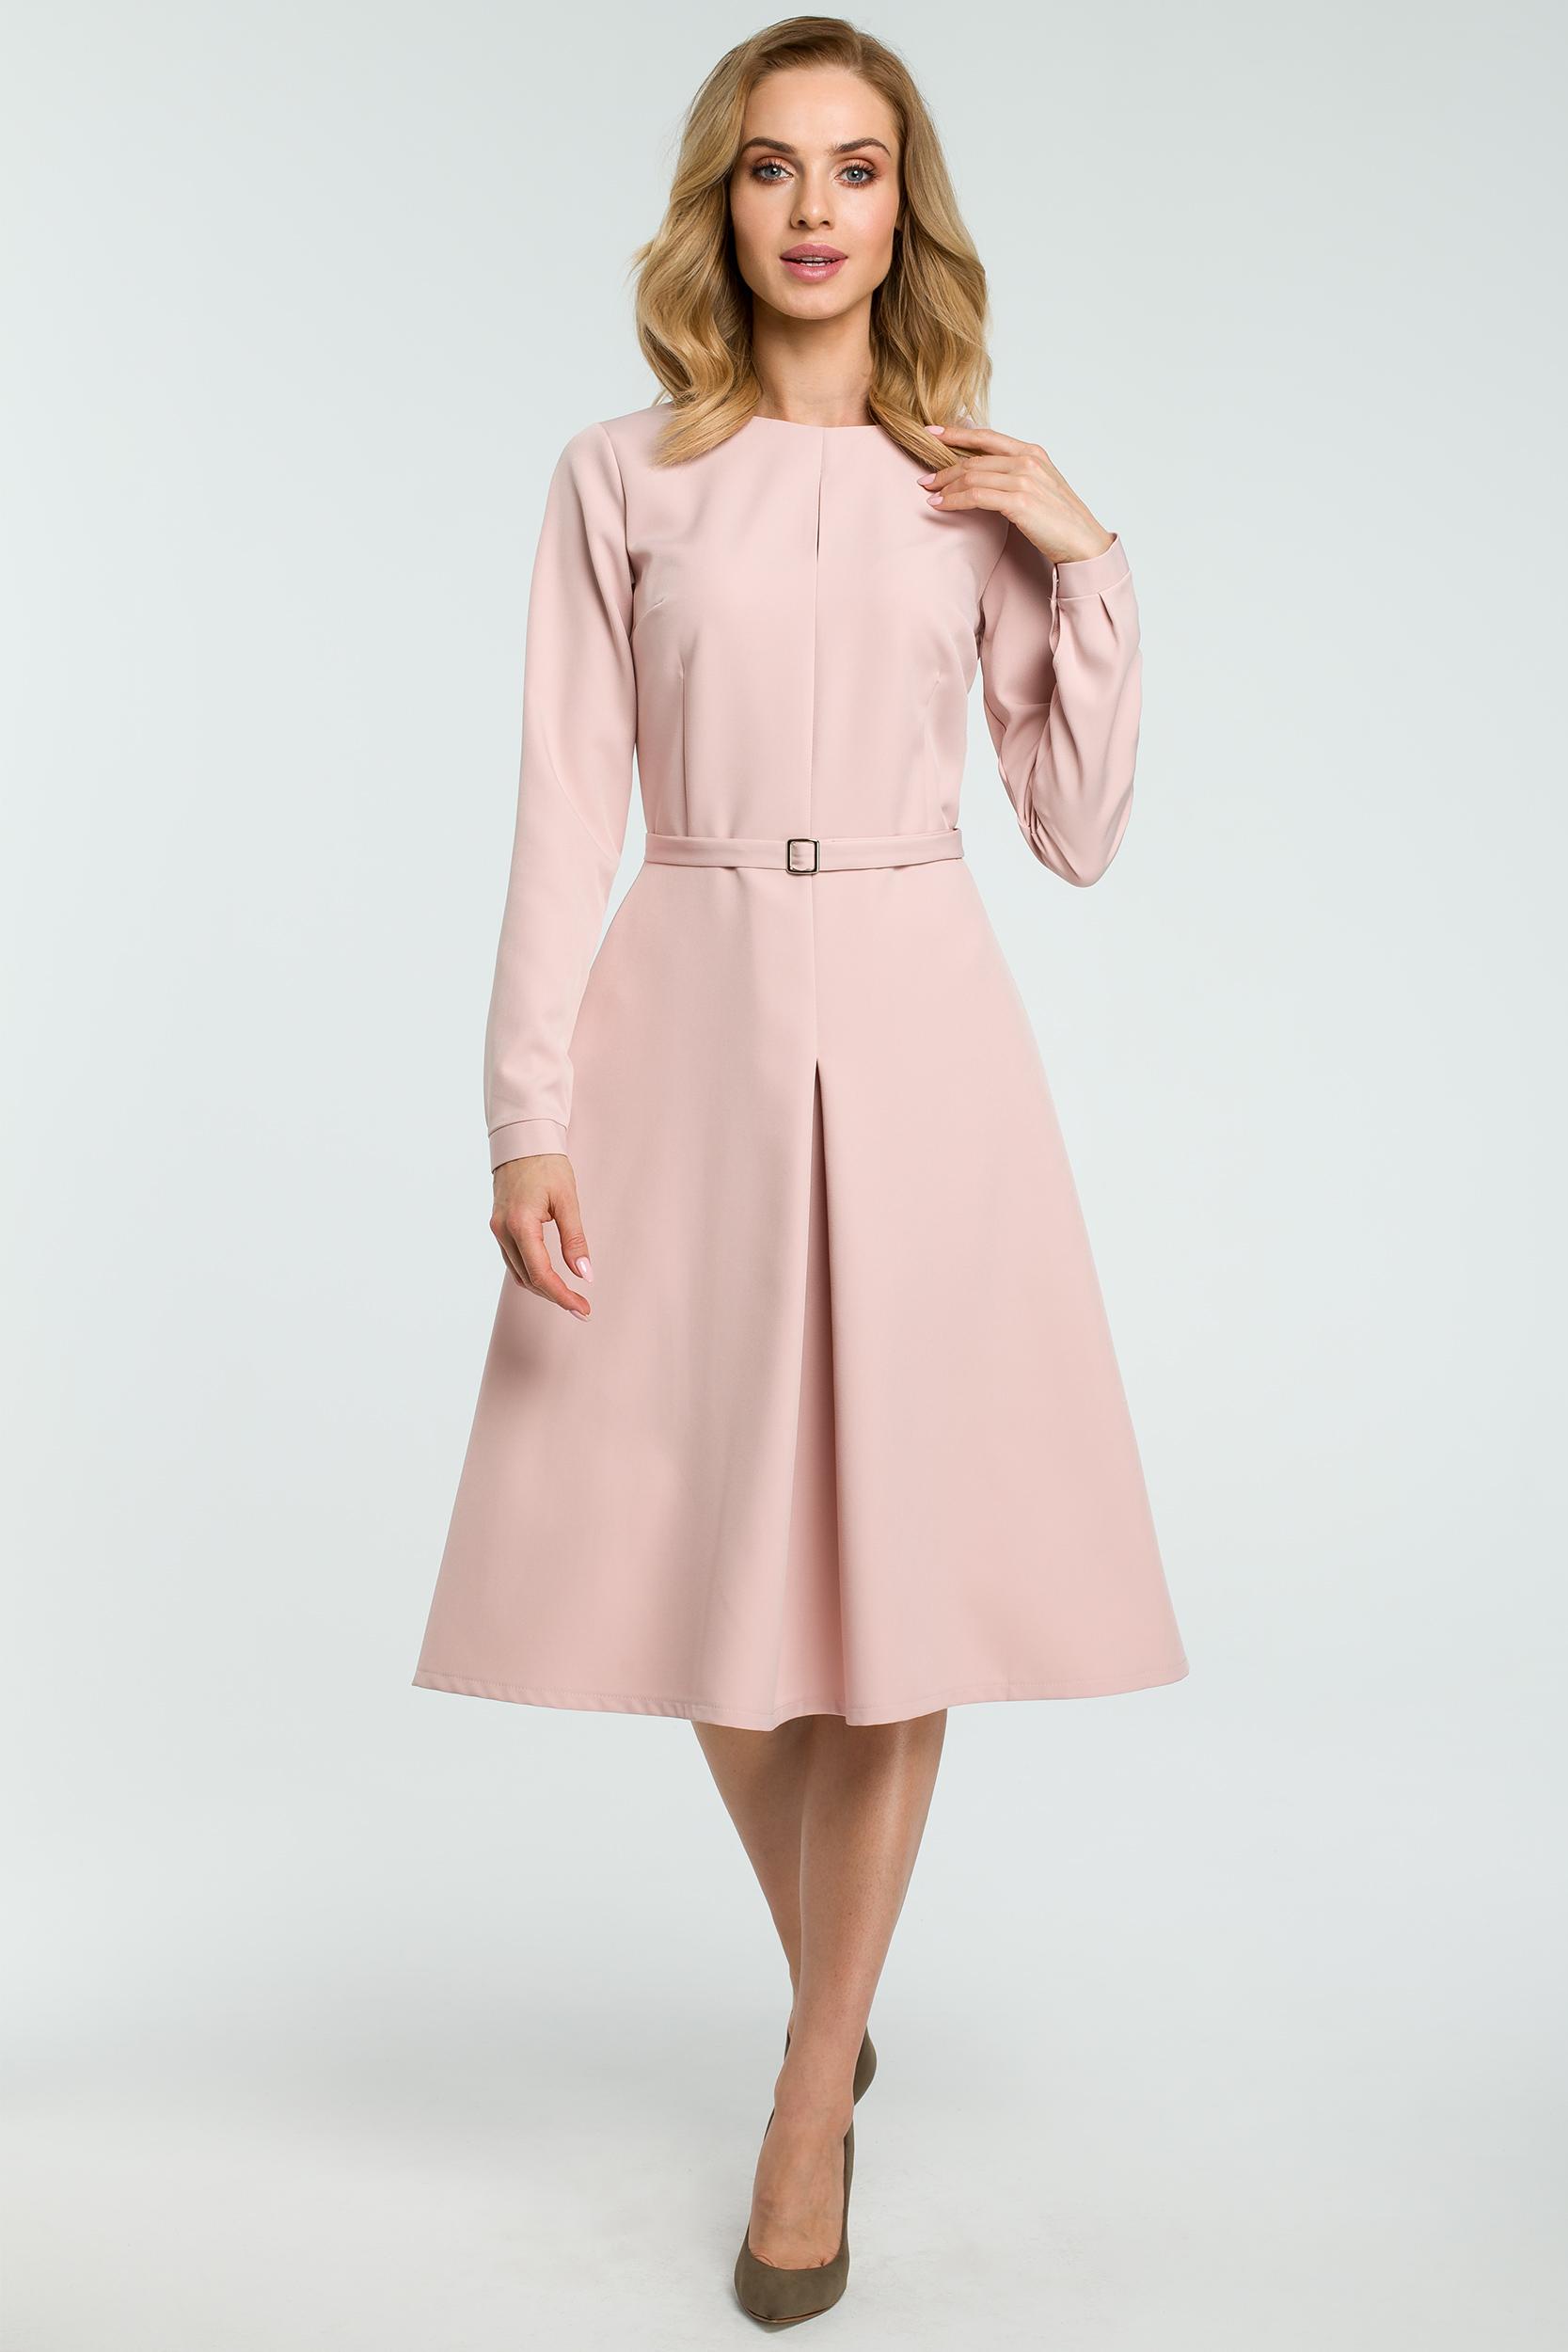 f410ba3e7d Elegancka rozkloszowana sukienka z paskiem różowa - kurier od 5